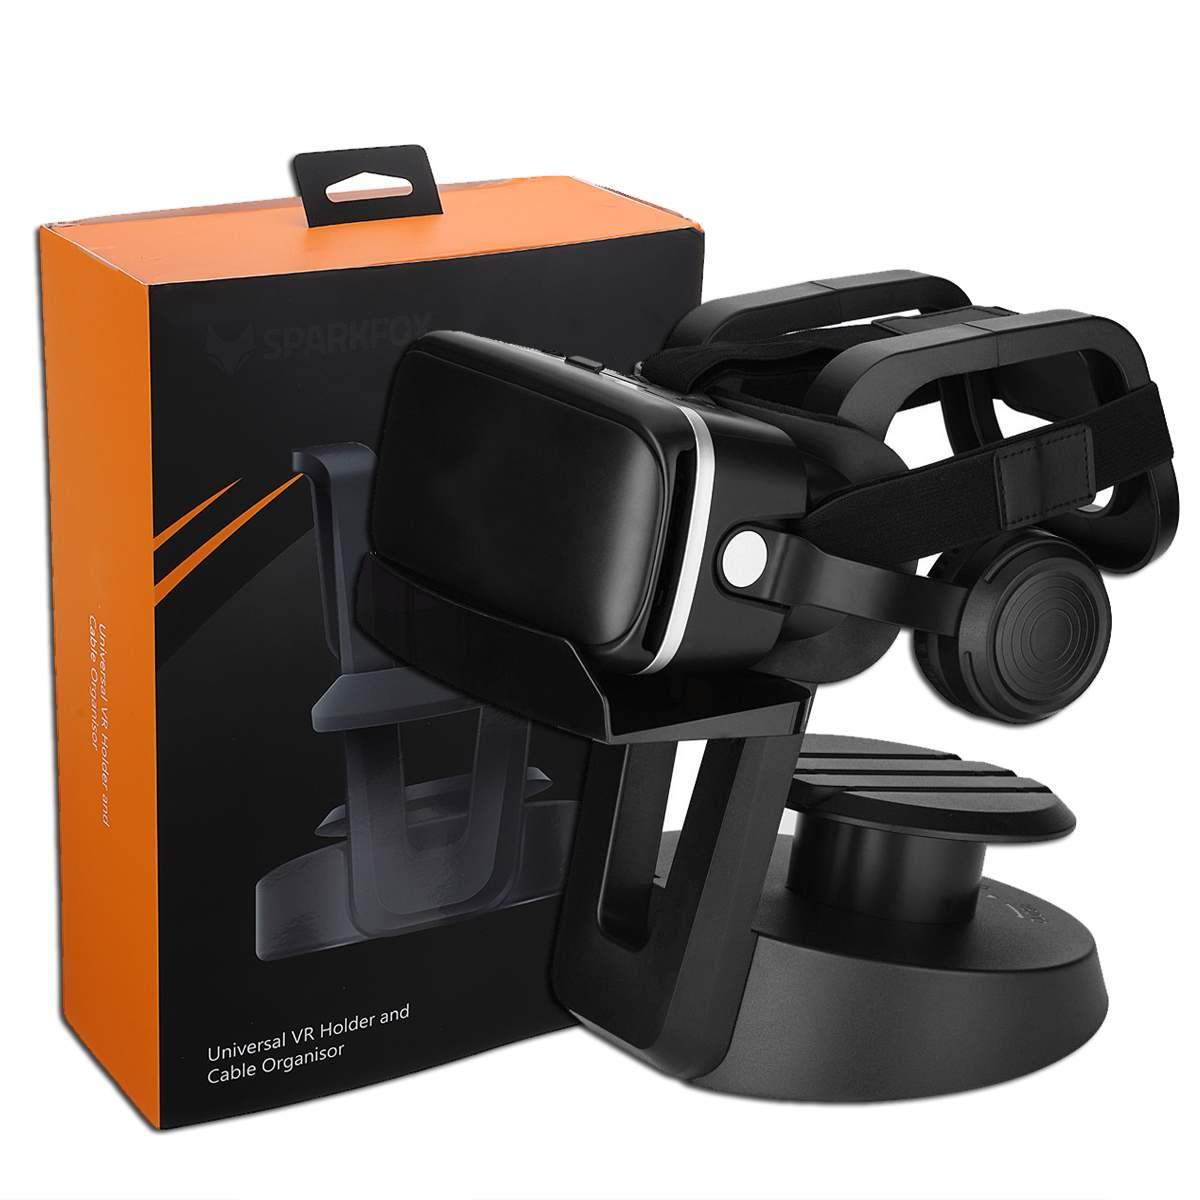 Cliate Universal VR Headset Holder Cable Organizer Stand Holder Display  Mount For PS4 PSVR Rift for HTC Vive Helmet